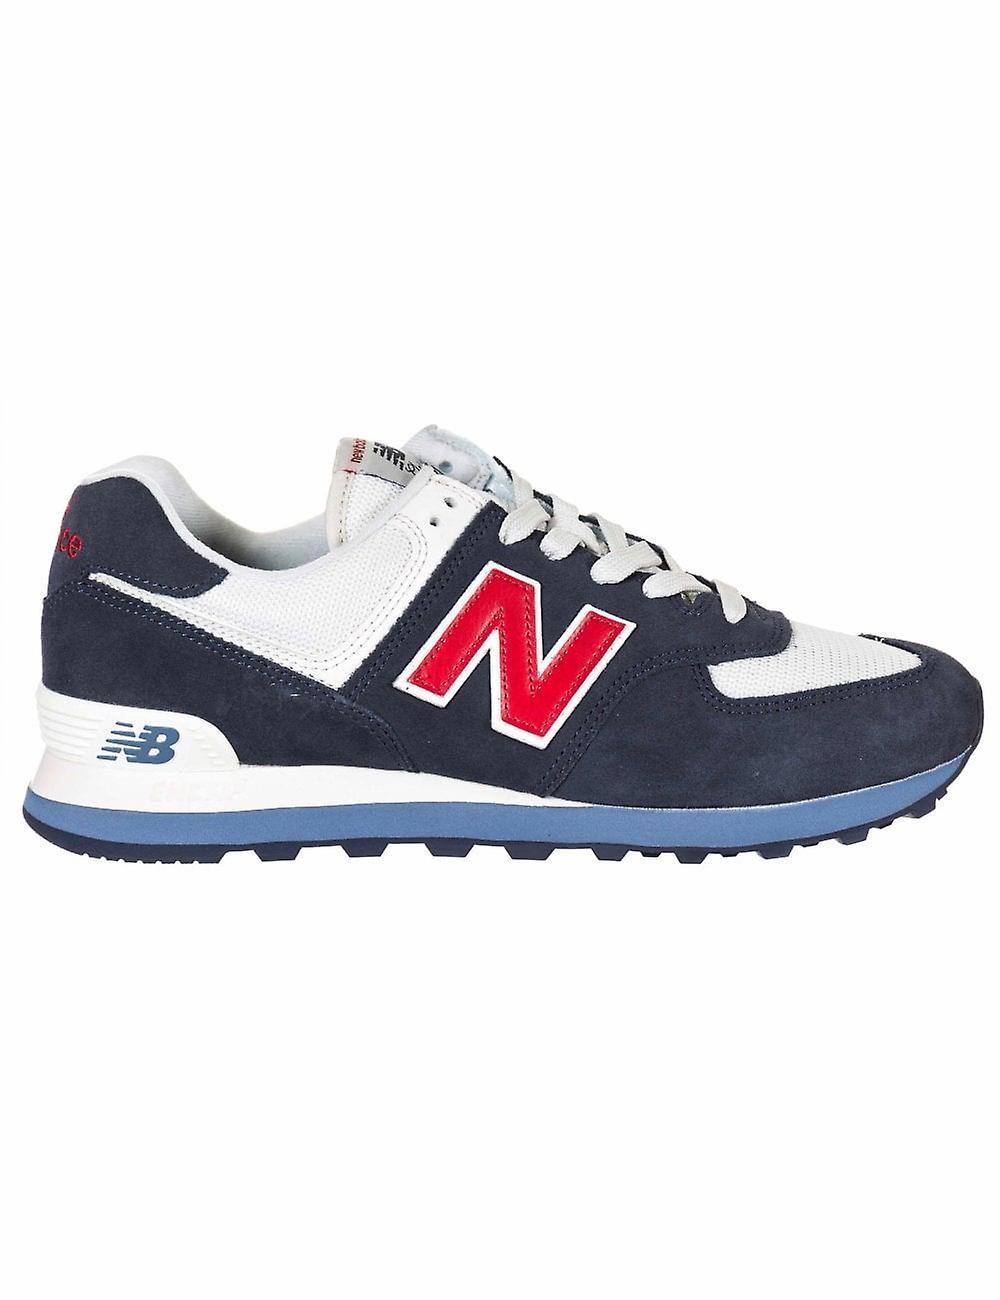 New Balance Ml574egb Trainers - Blue